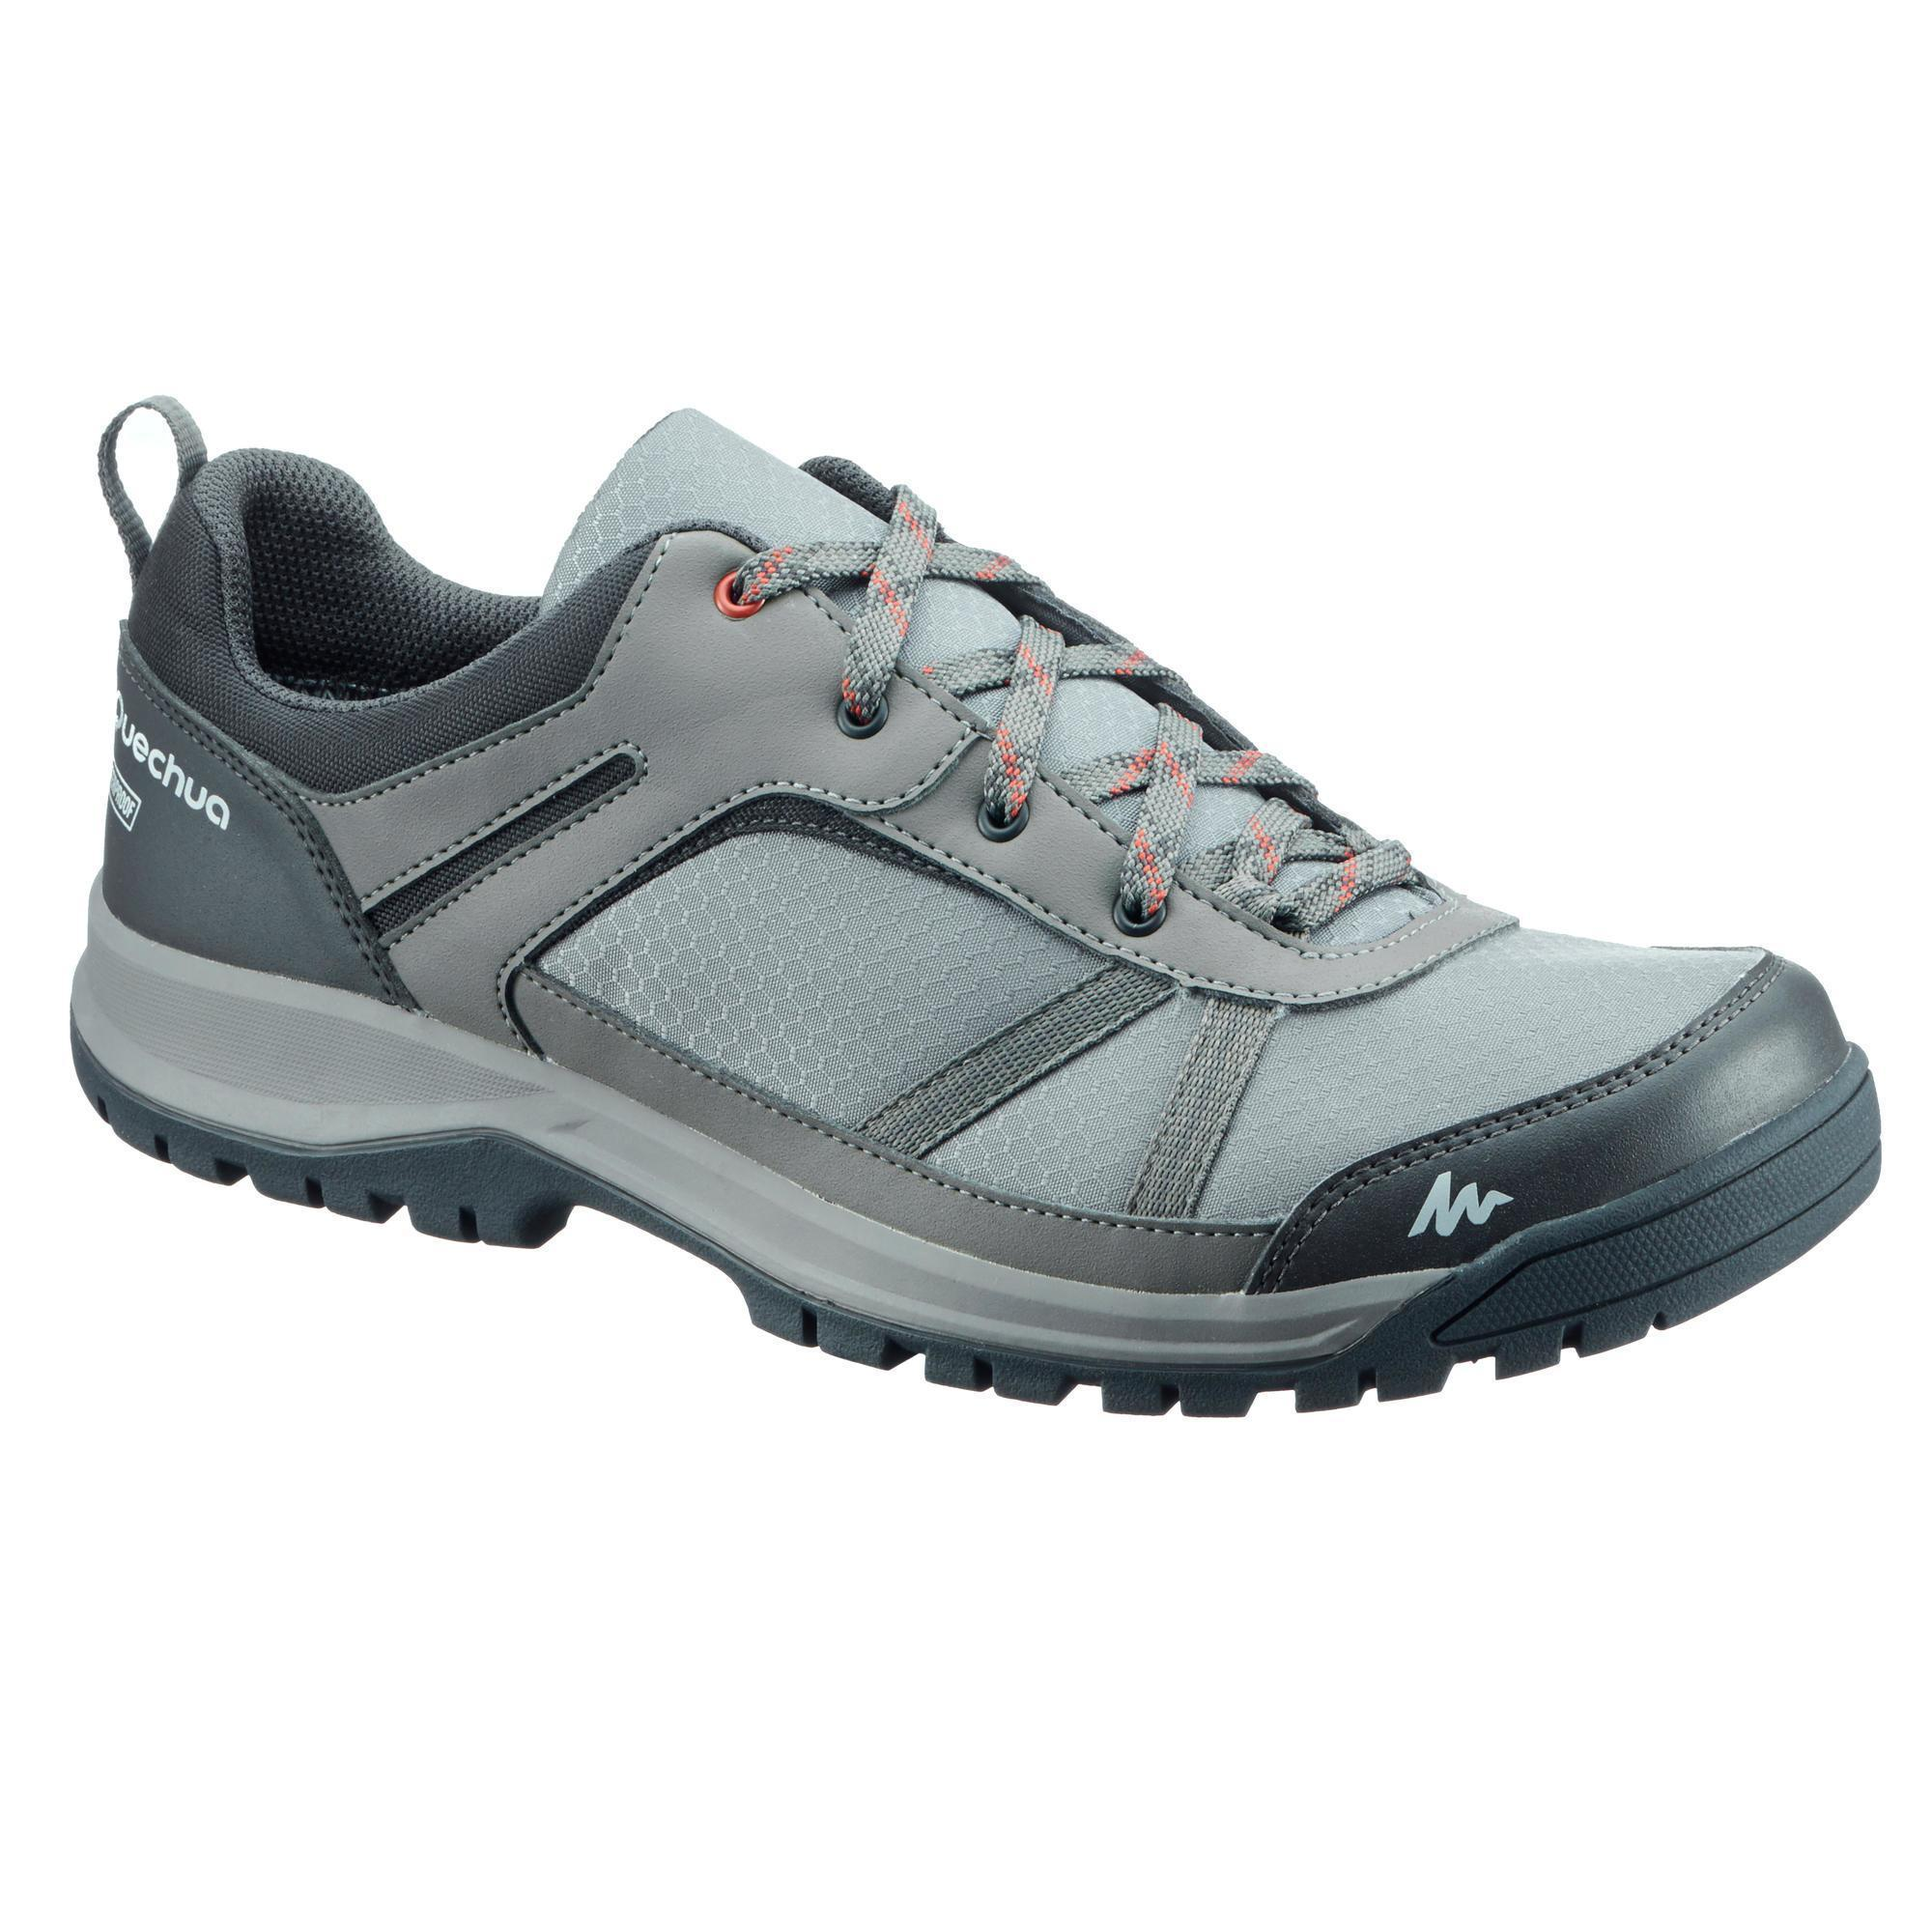 Nh300 Waterproof Men S Nature Hiking Boots Green Grey Quechua